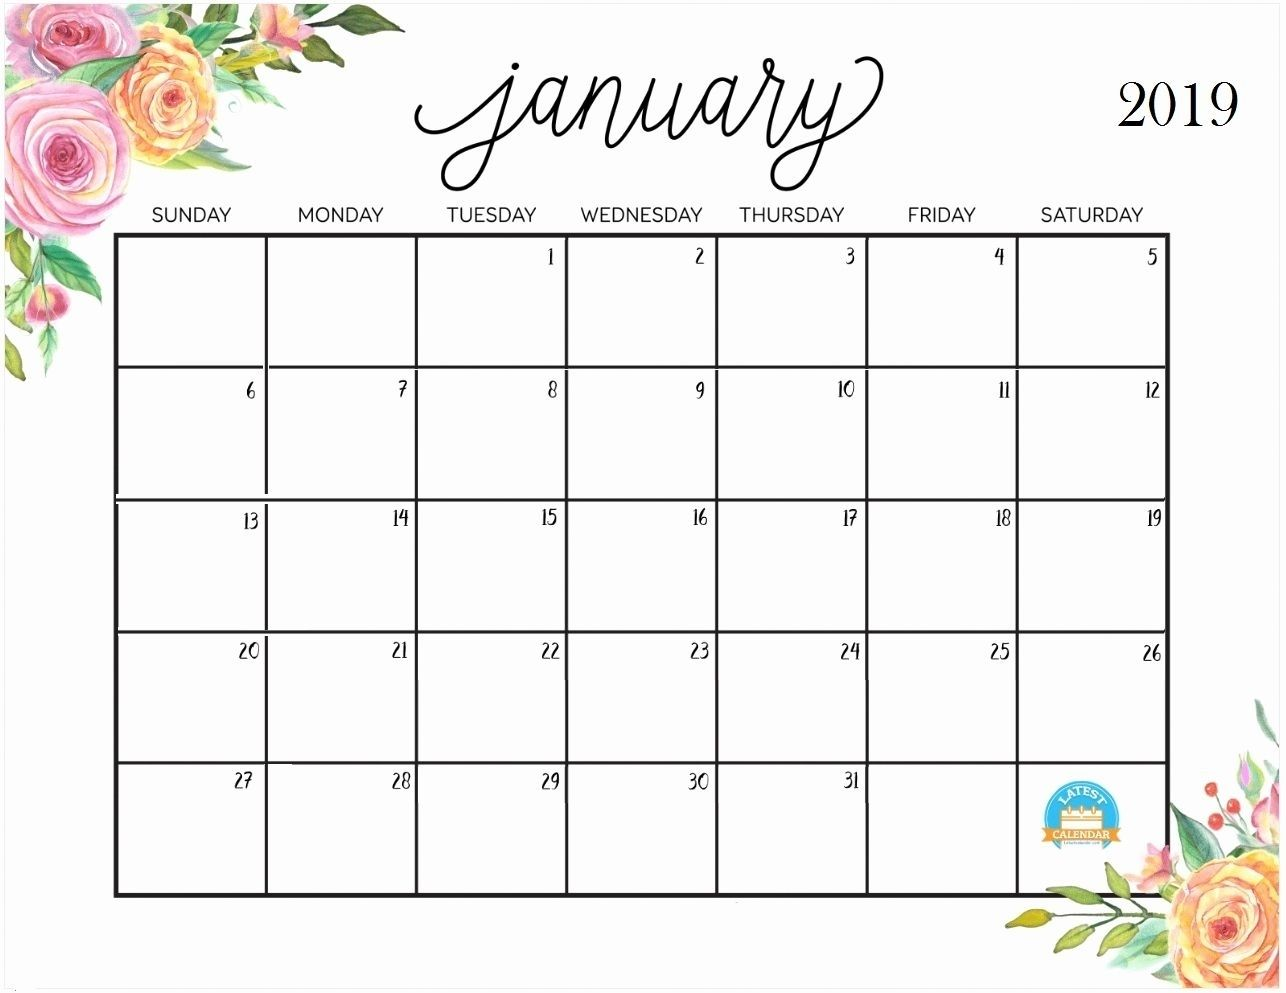 January 2019 Calendar Printable One Page Calendar Template